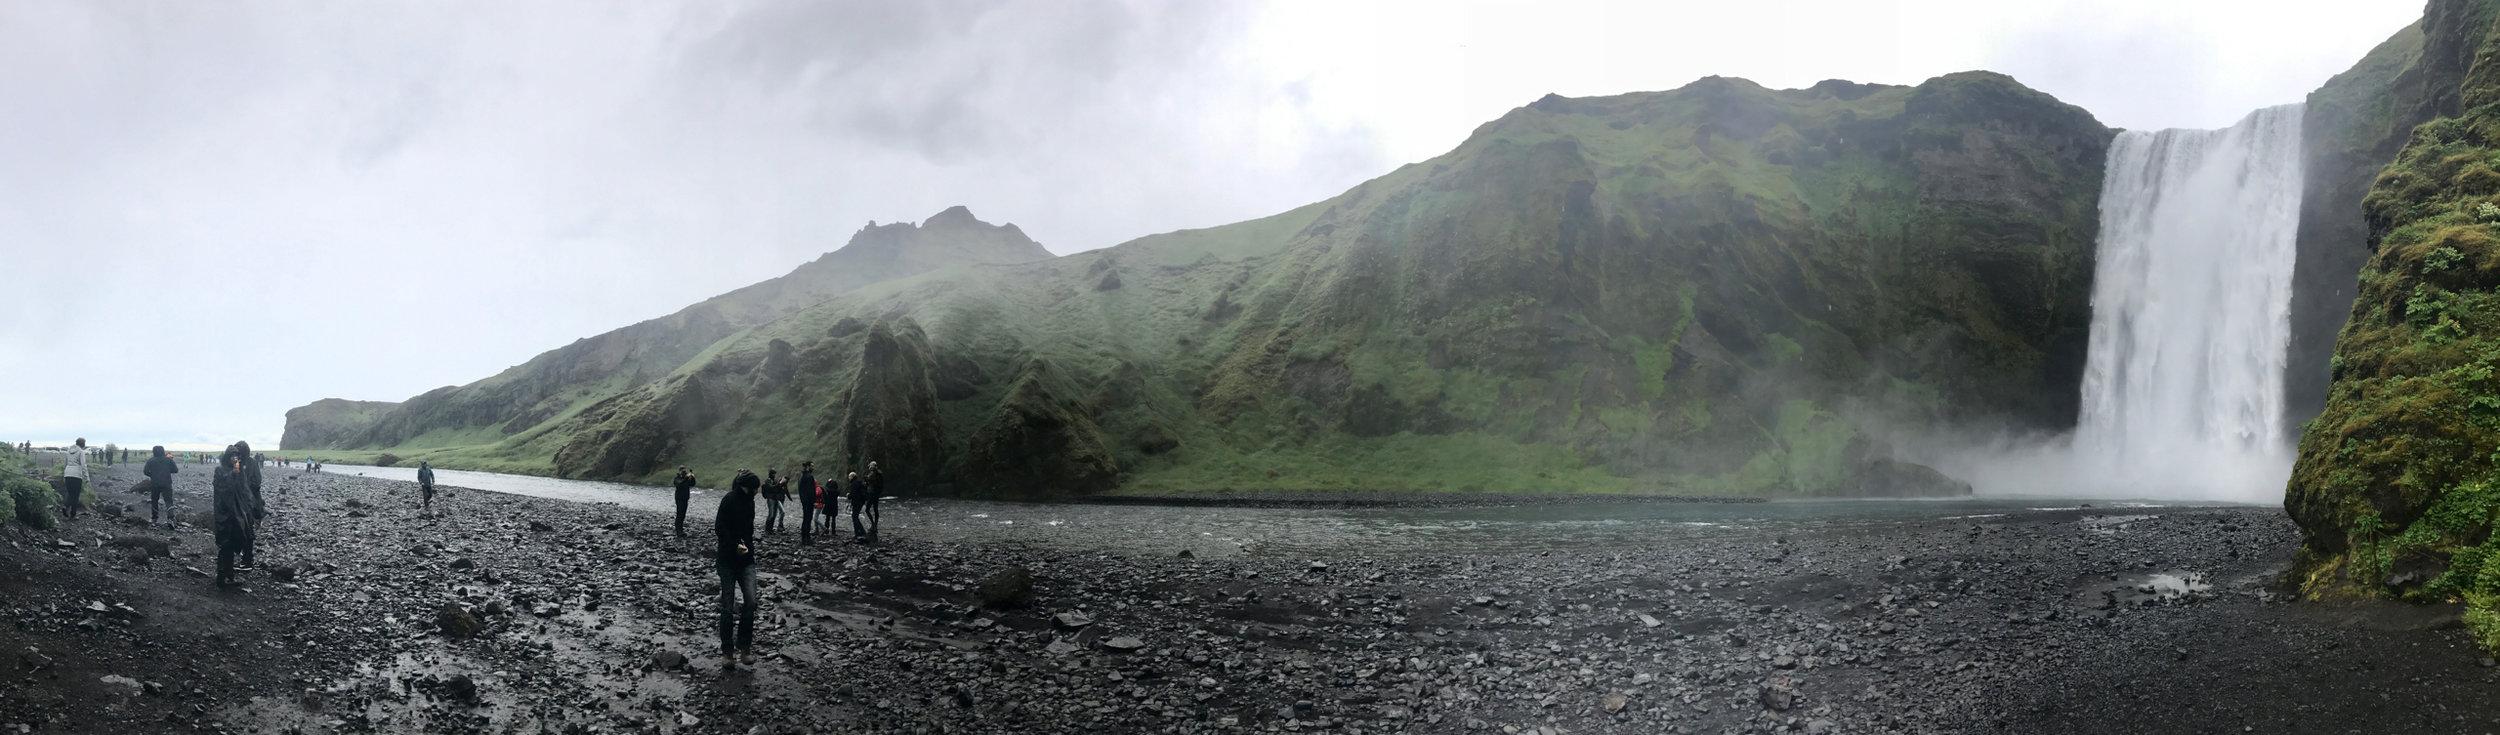 Dedifoss waterfall